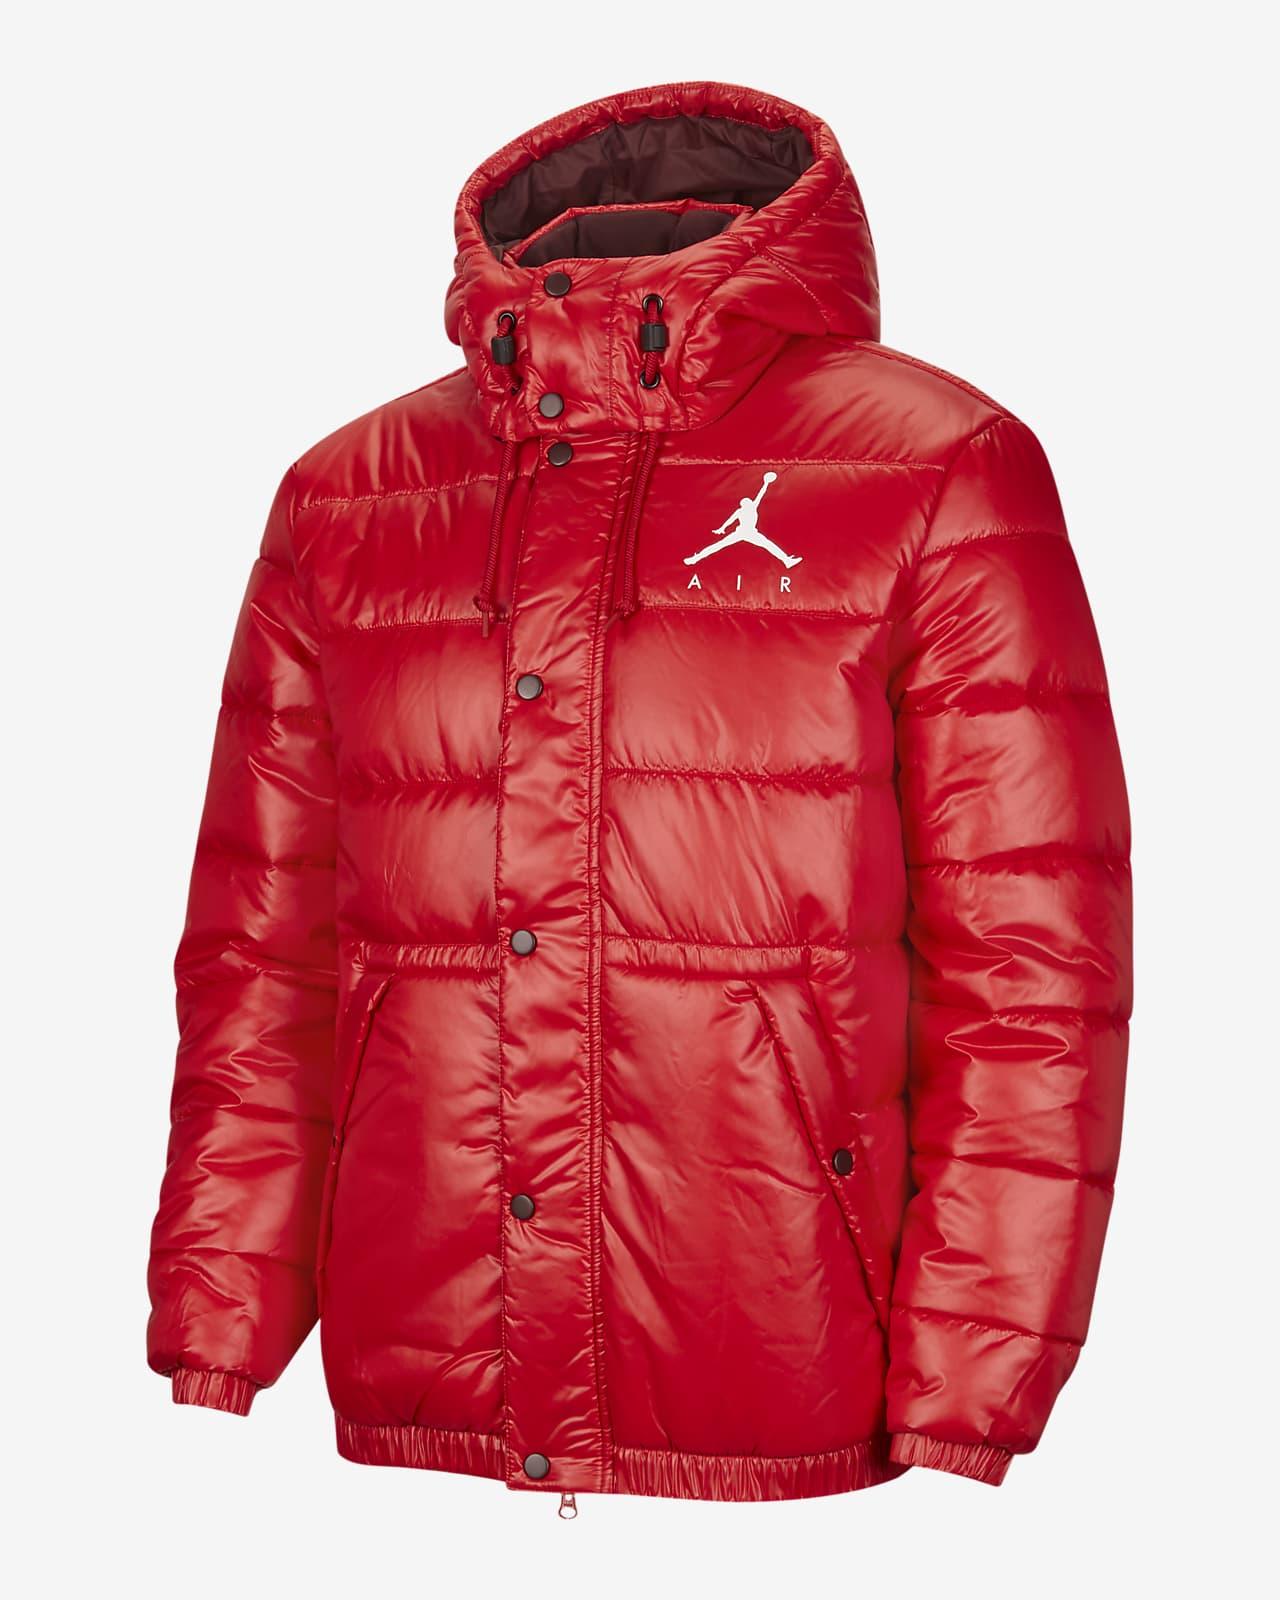 Nike 耐克 Jordan Jumpman 男子连帽保暖夹克 DC3735 优惠码折后¥619包邮